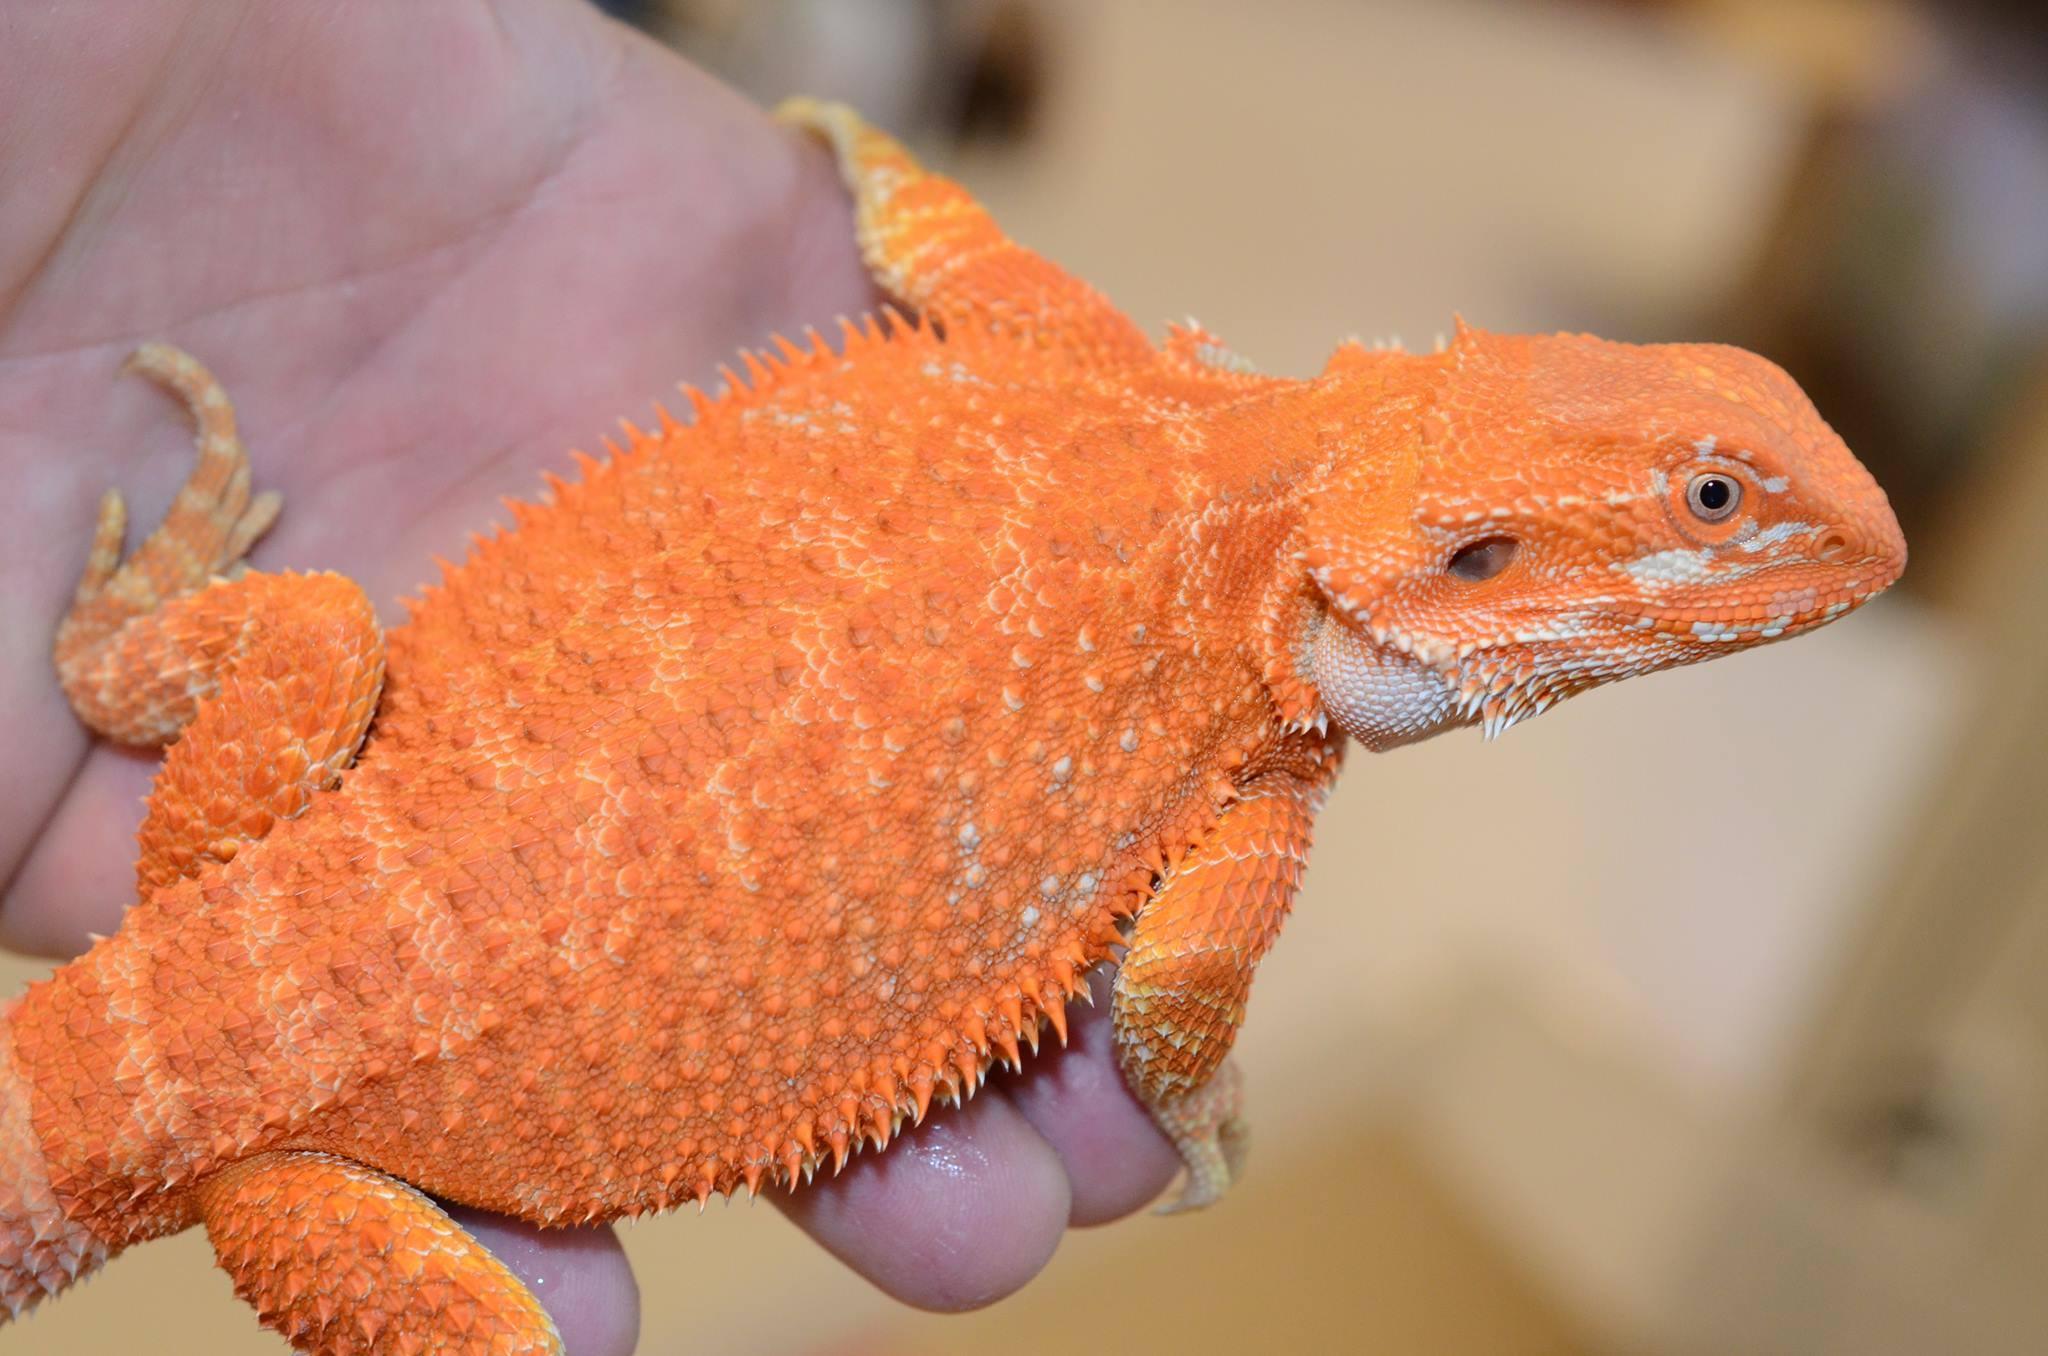 Azula - Hypo Orange Red Bearded Dragon - Female